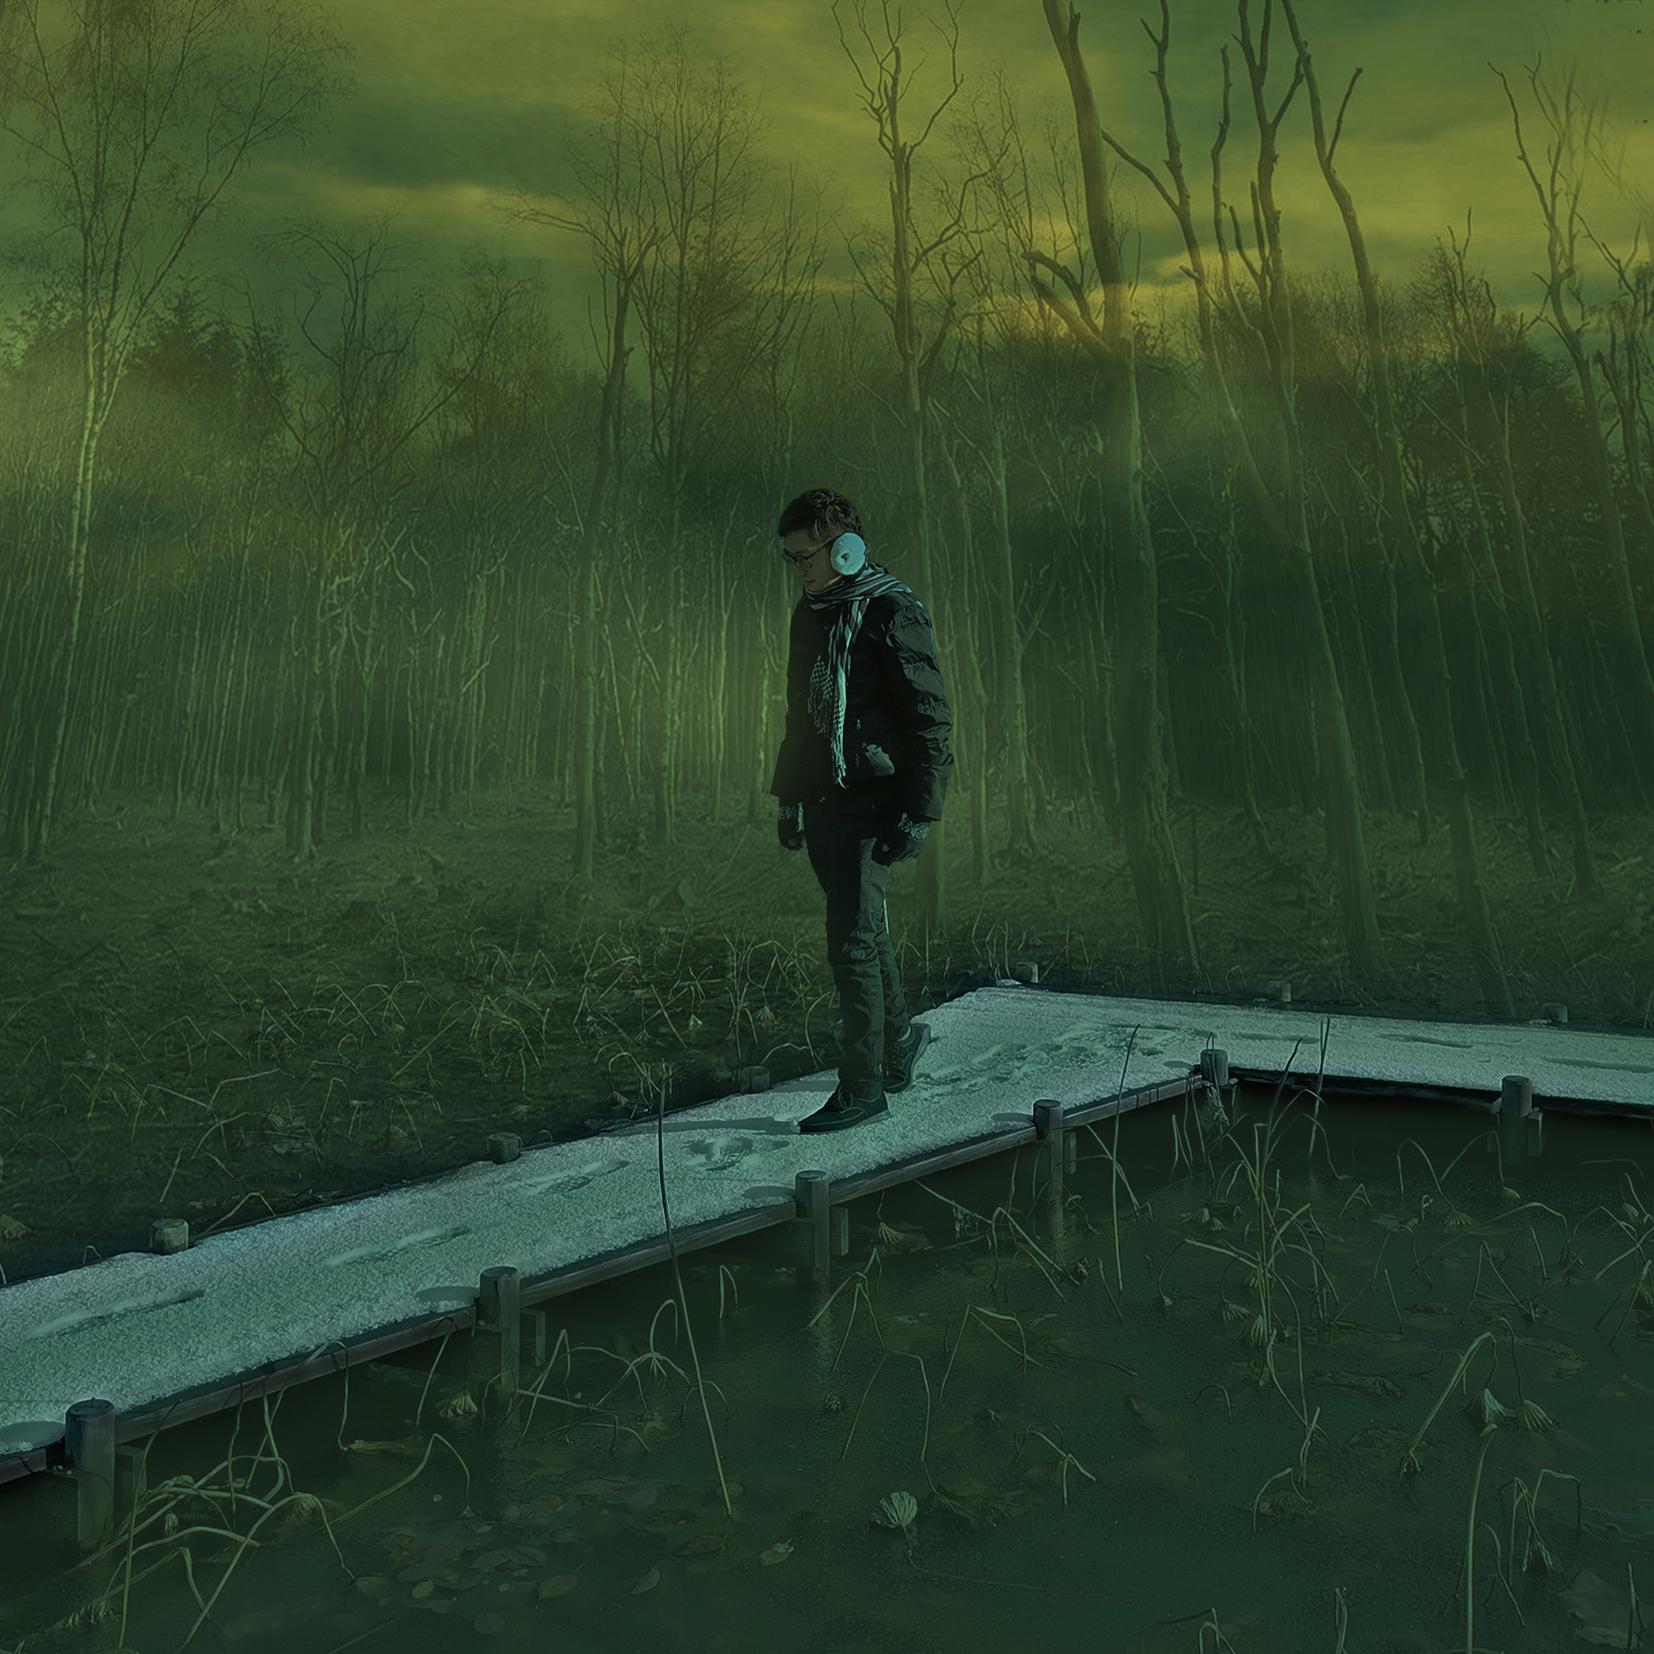 Death Swamp Digital Art by Alvin Sim